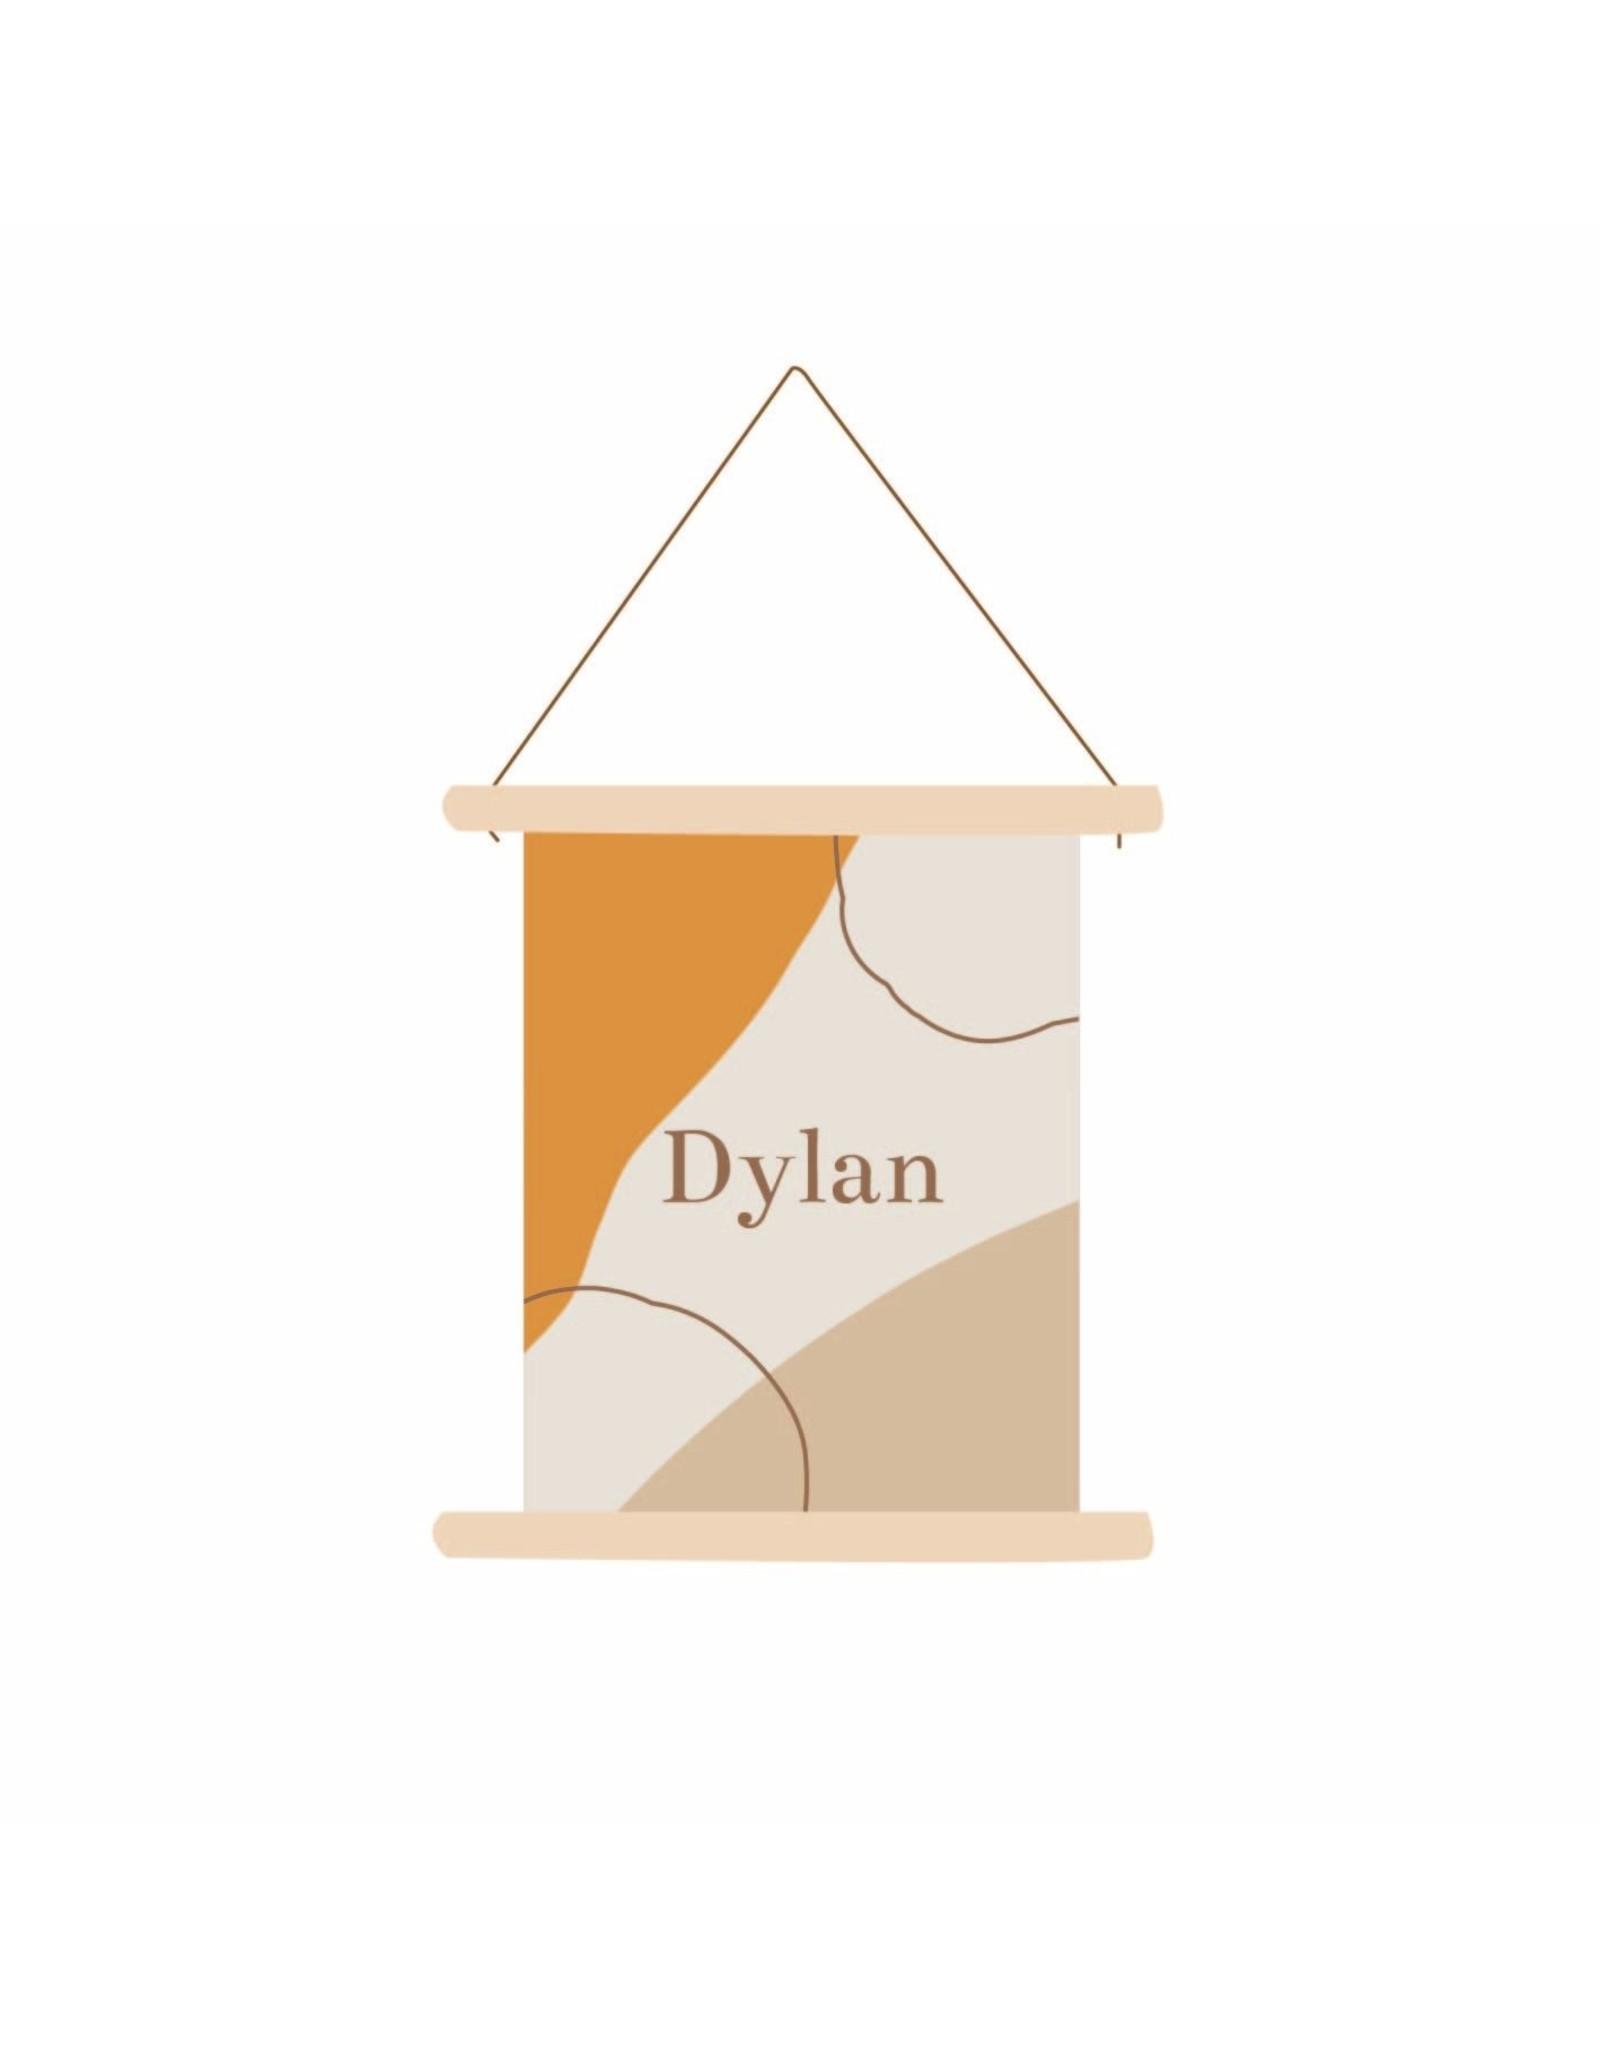 studiobydiede Textielposter Dylan